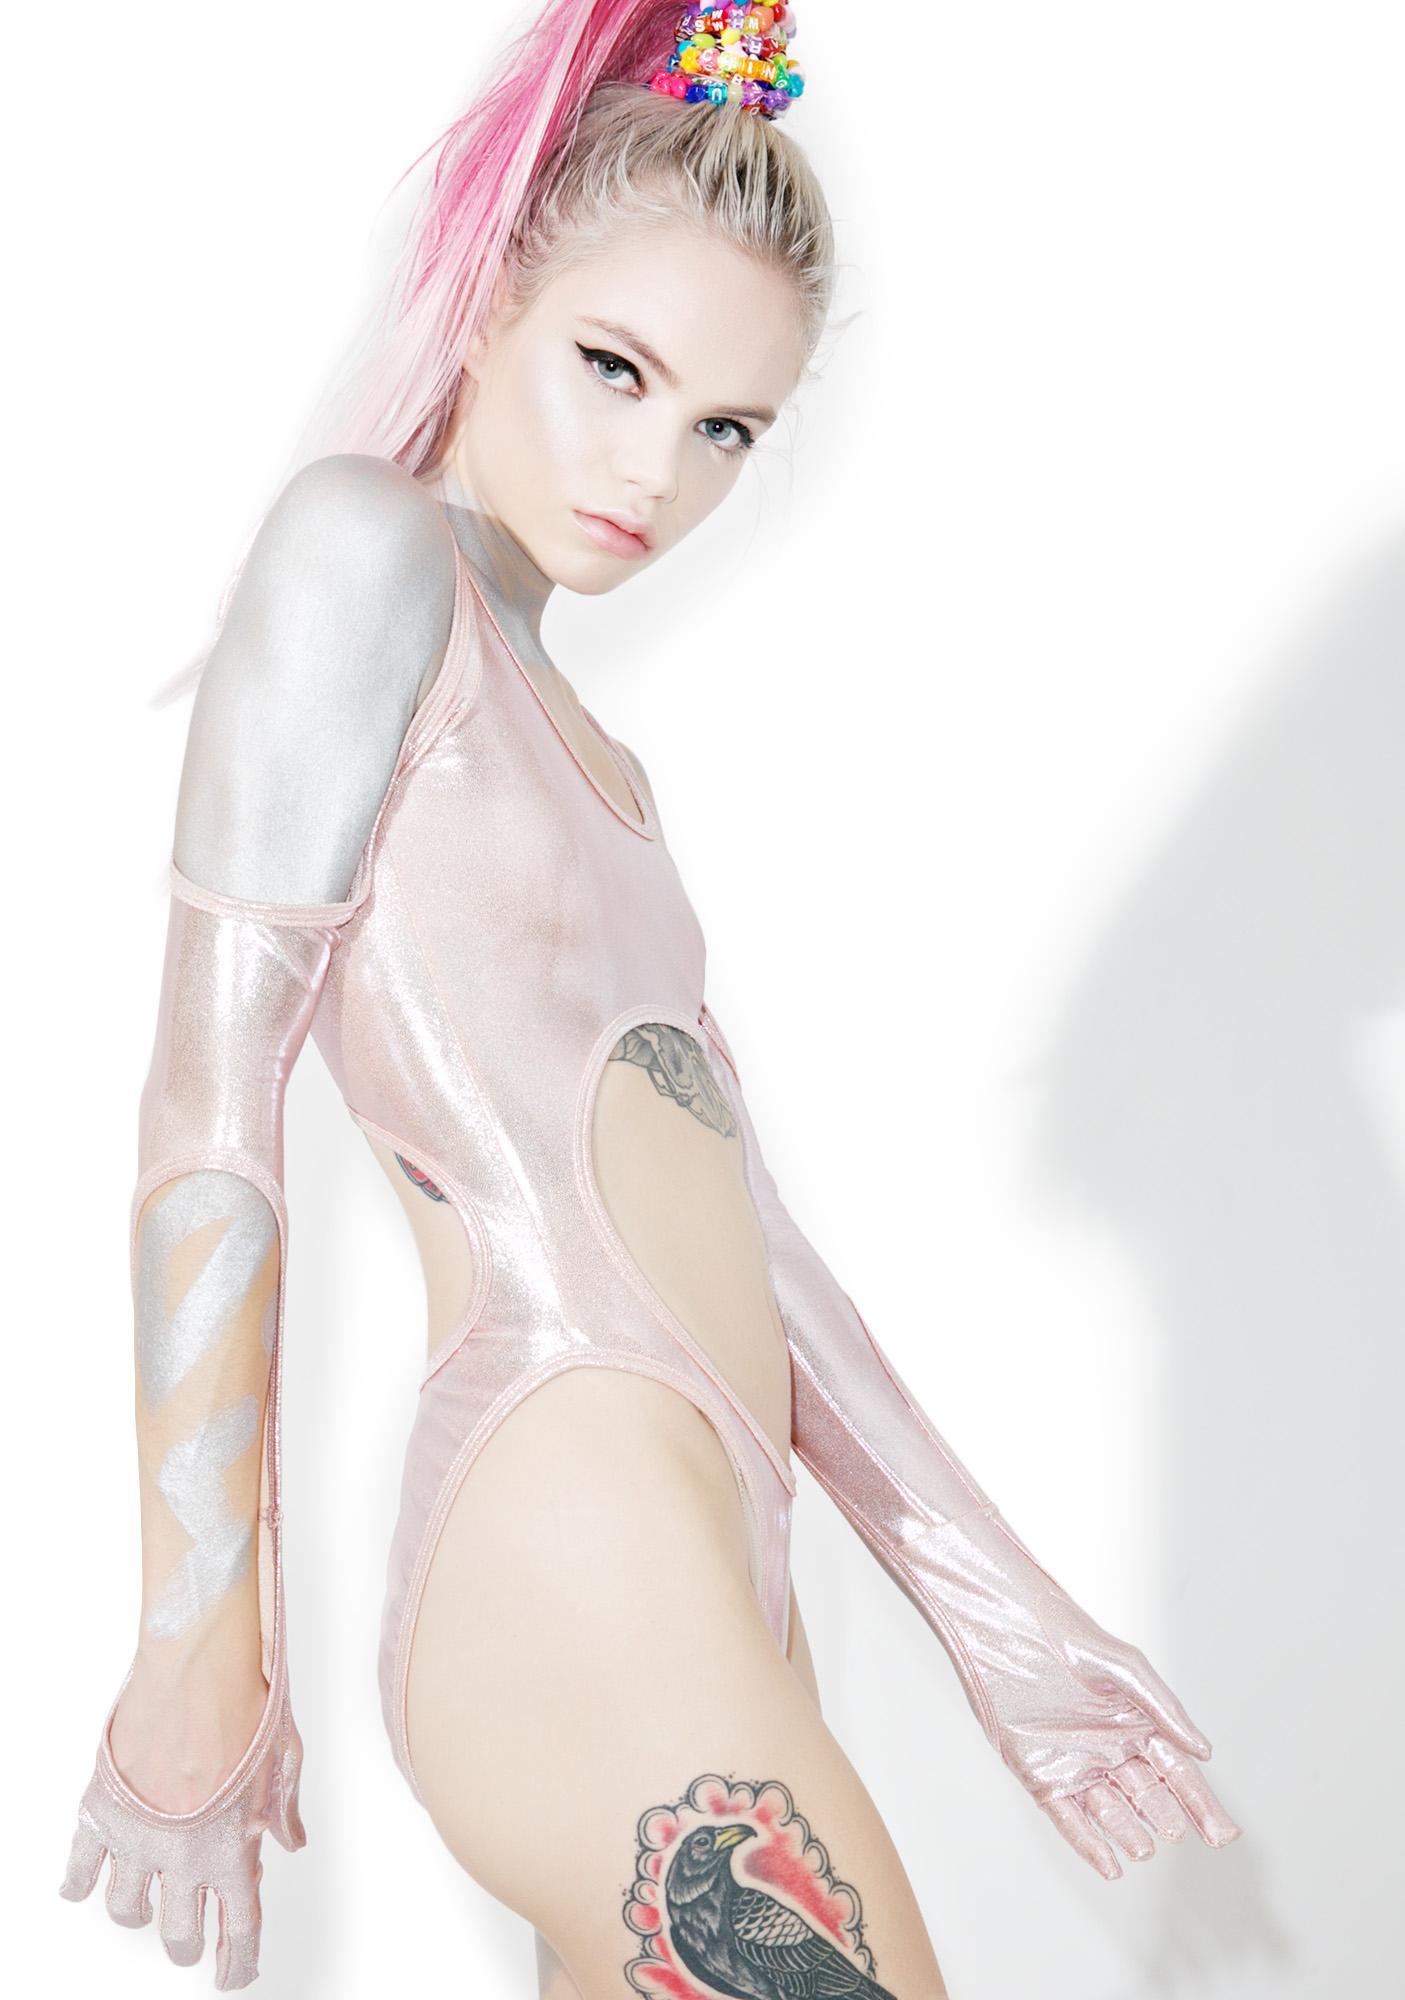 Mamadoux Alien Skin Bodysuit